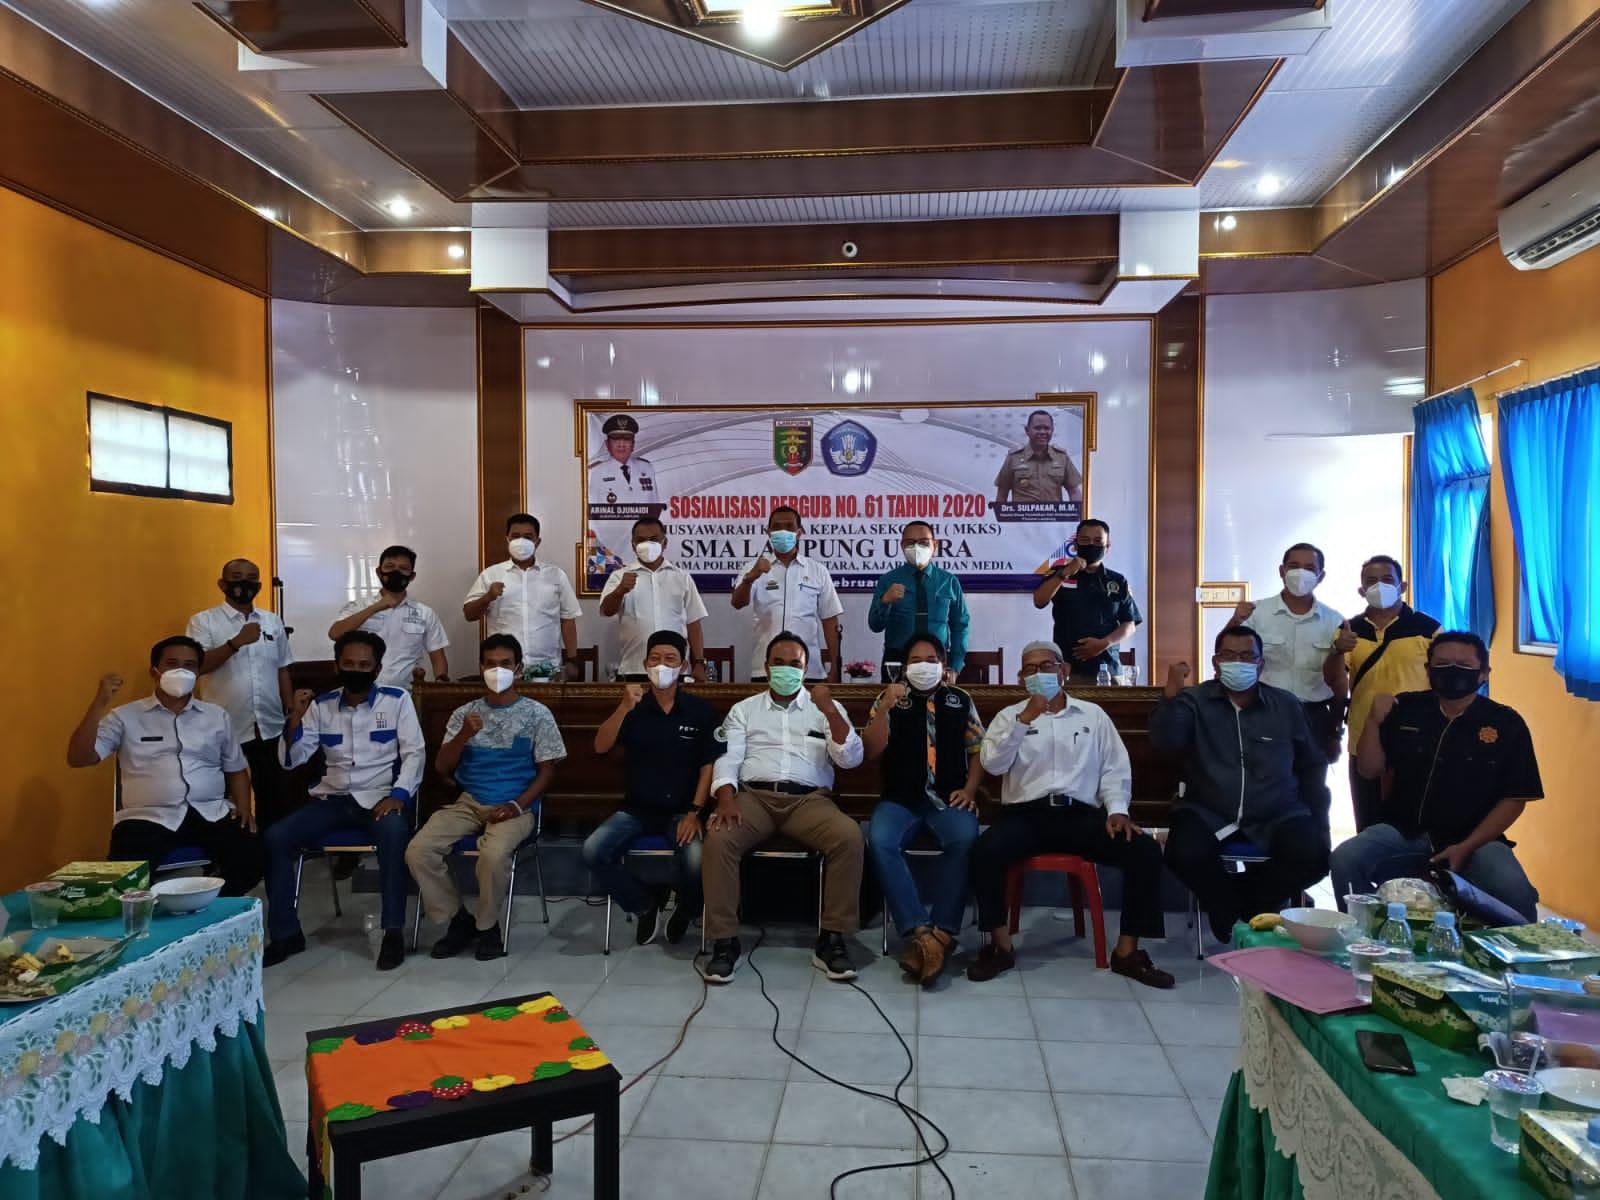 MKKS SMA Lampura Sosialisasikan Pergub Nomor 61 Tahun 2020